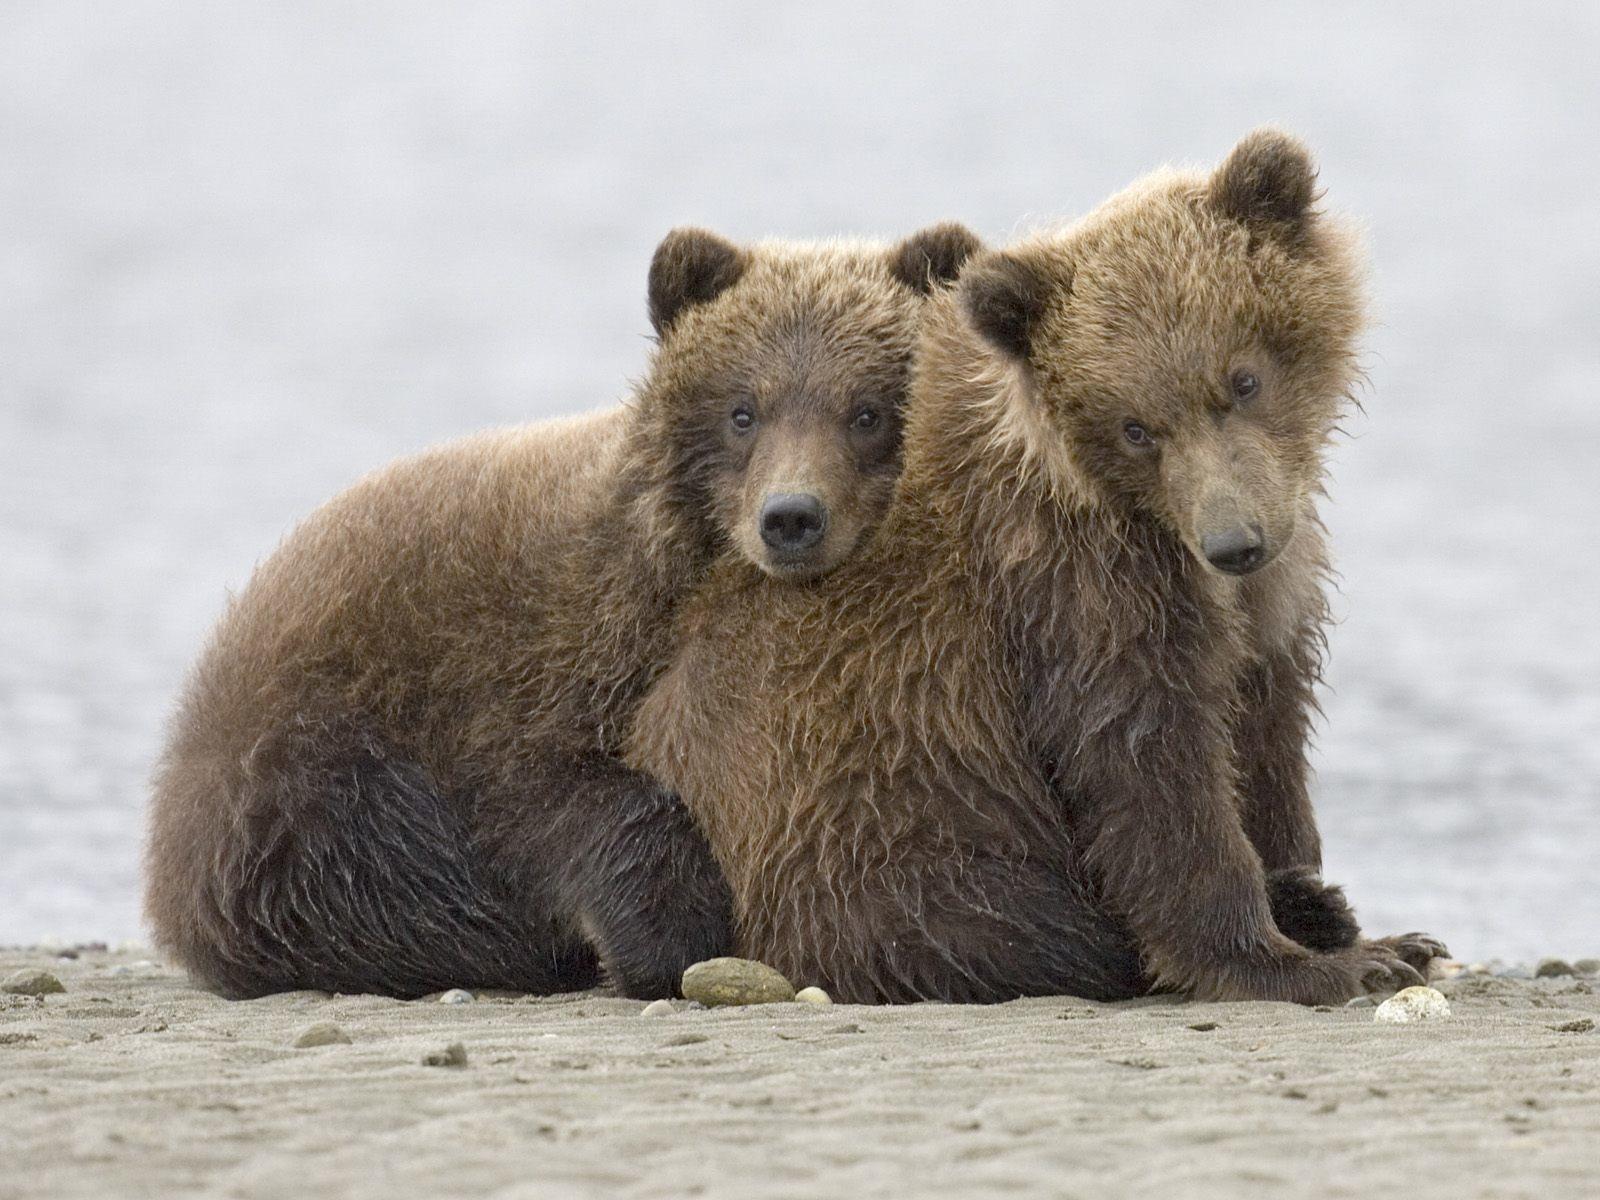 Cute Baby Bears Wallpaper 26 Fondos De Pantalla Del Oso Pardo Wallpapers De Osos En Hd